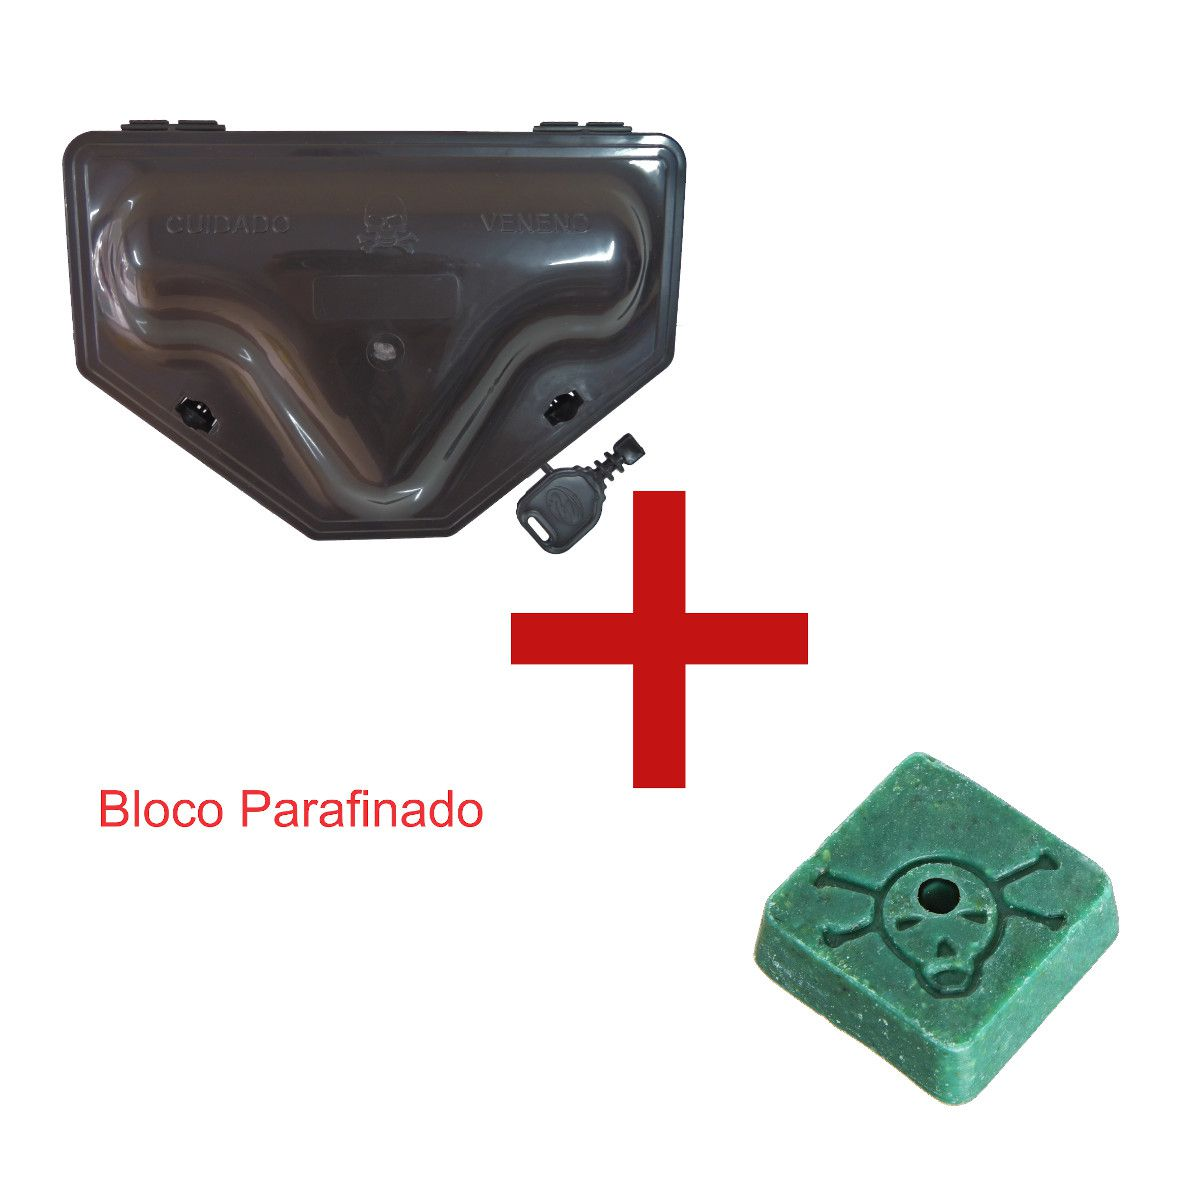 KIT 35 Porta Iscas Reforçado 2 TRAVAS Chave Ratoeira p/Ratos